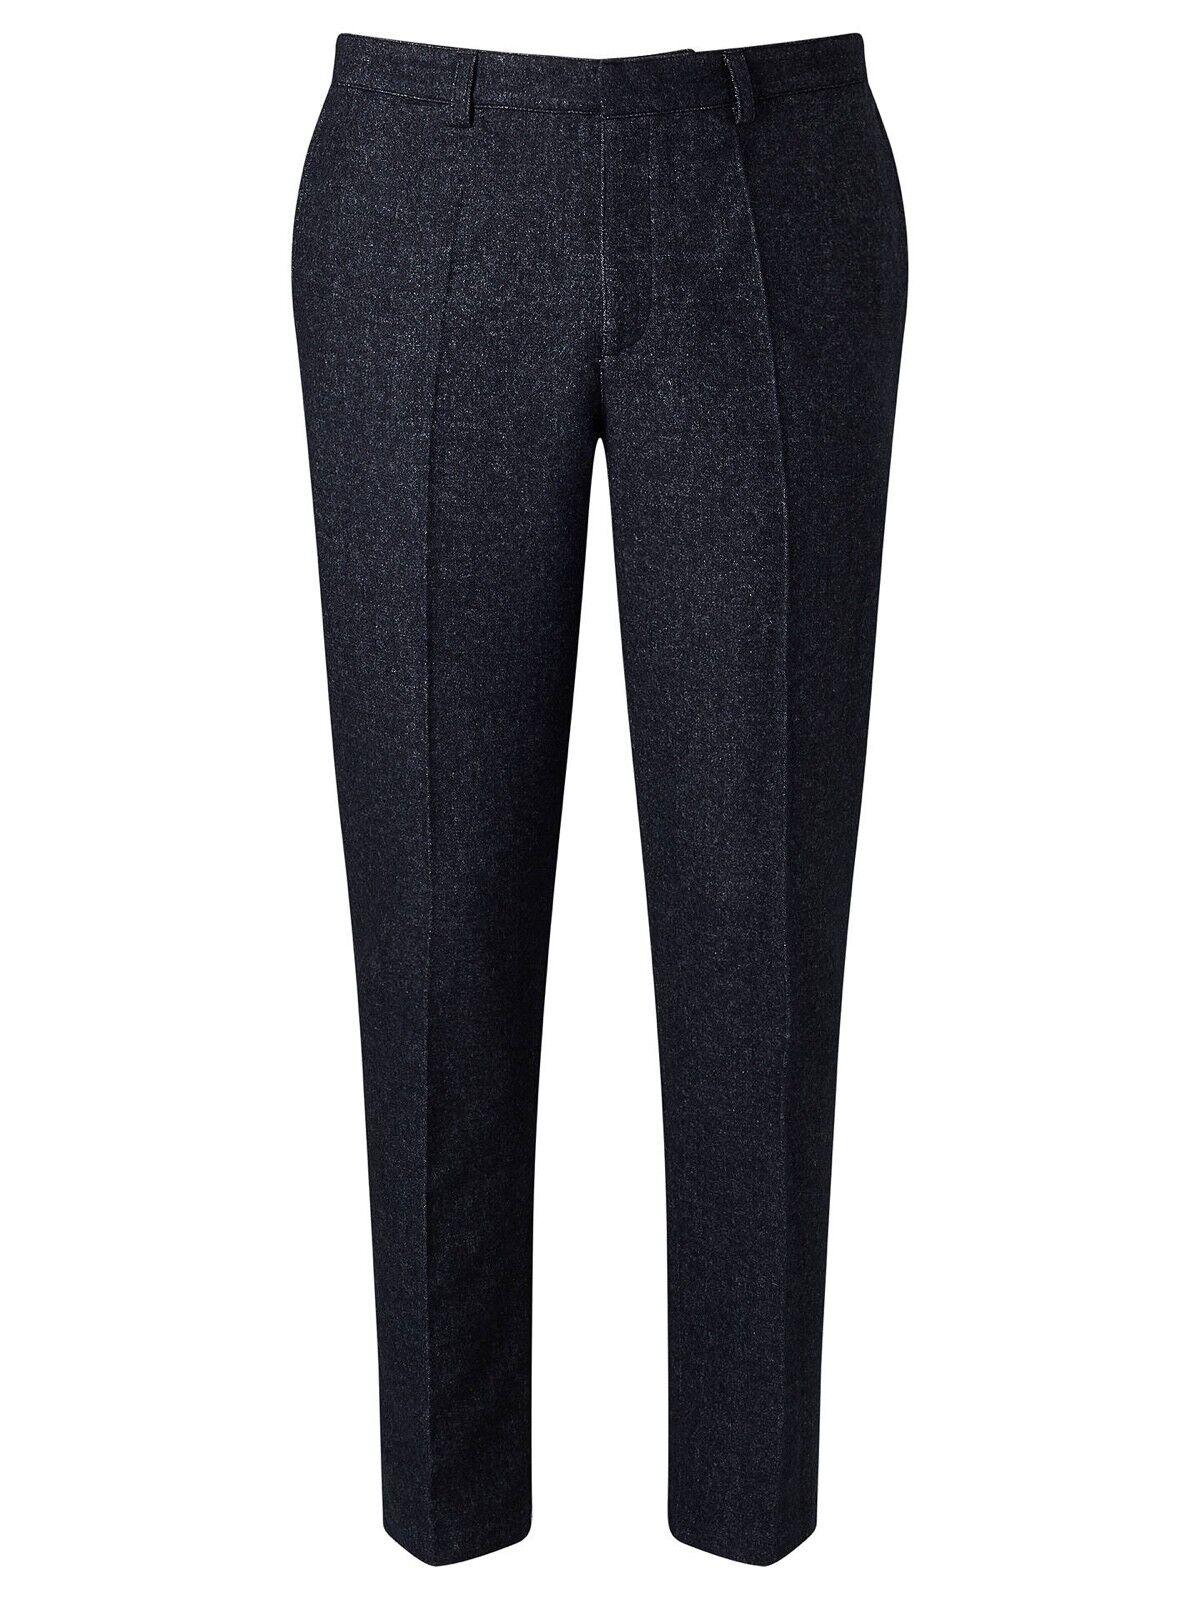 Libertine-Libertine Tell Transworld Wool Trousers Dark Navy LARGE X LARGE